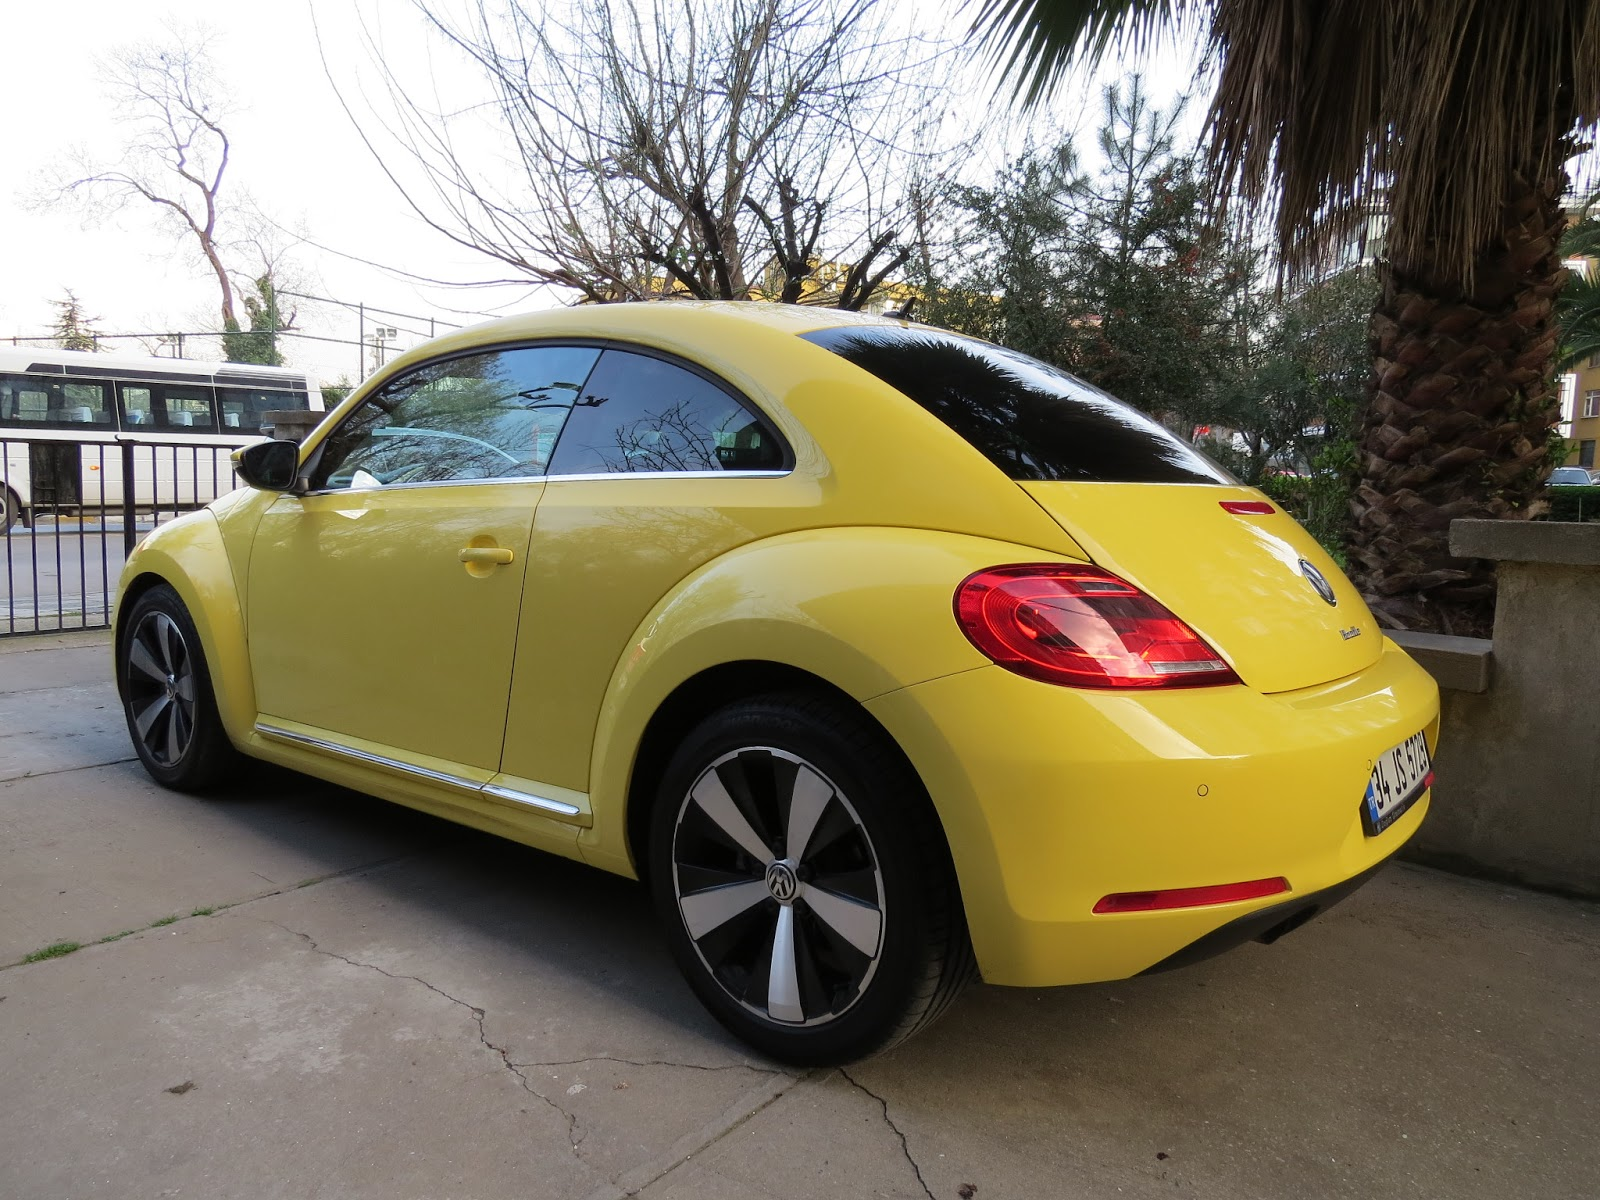 Who Designed The Vw Beetle >> Agamemnon: Volkswagen Beetle 1.2 TSI DSG Design